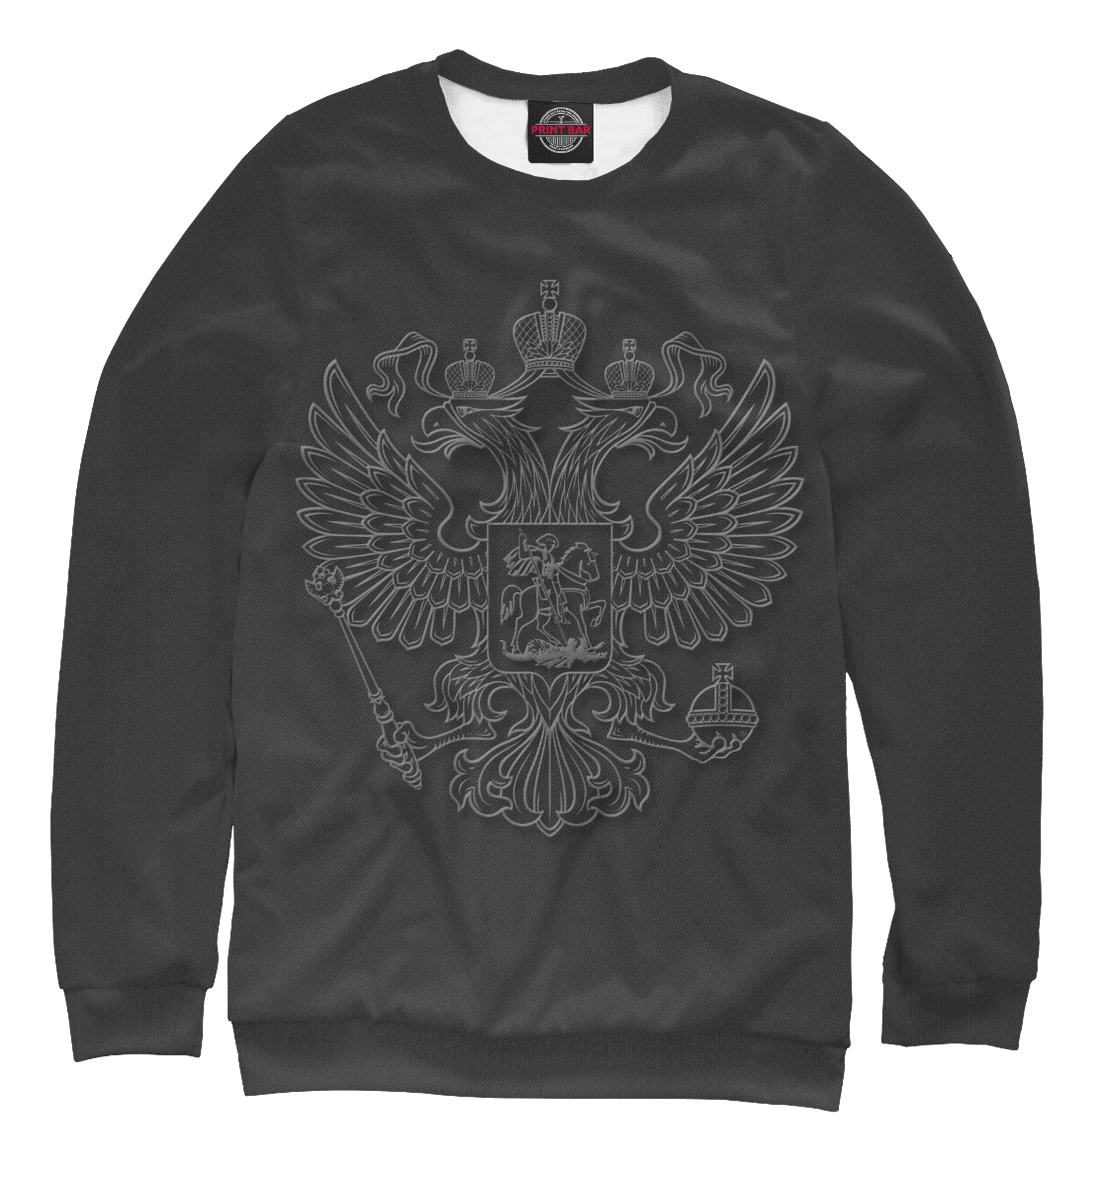 Купить Россия Герб 3D, Printbar, Свитшоты, SRF-266046-swi-1